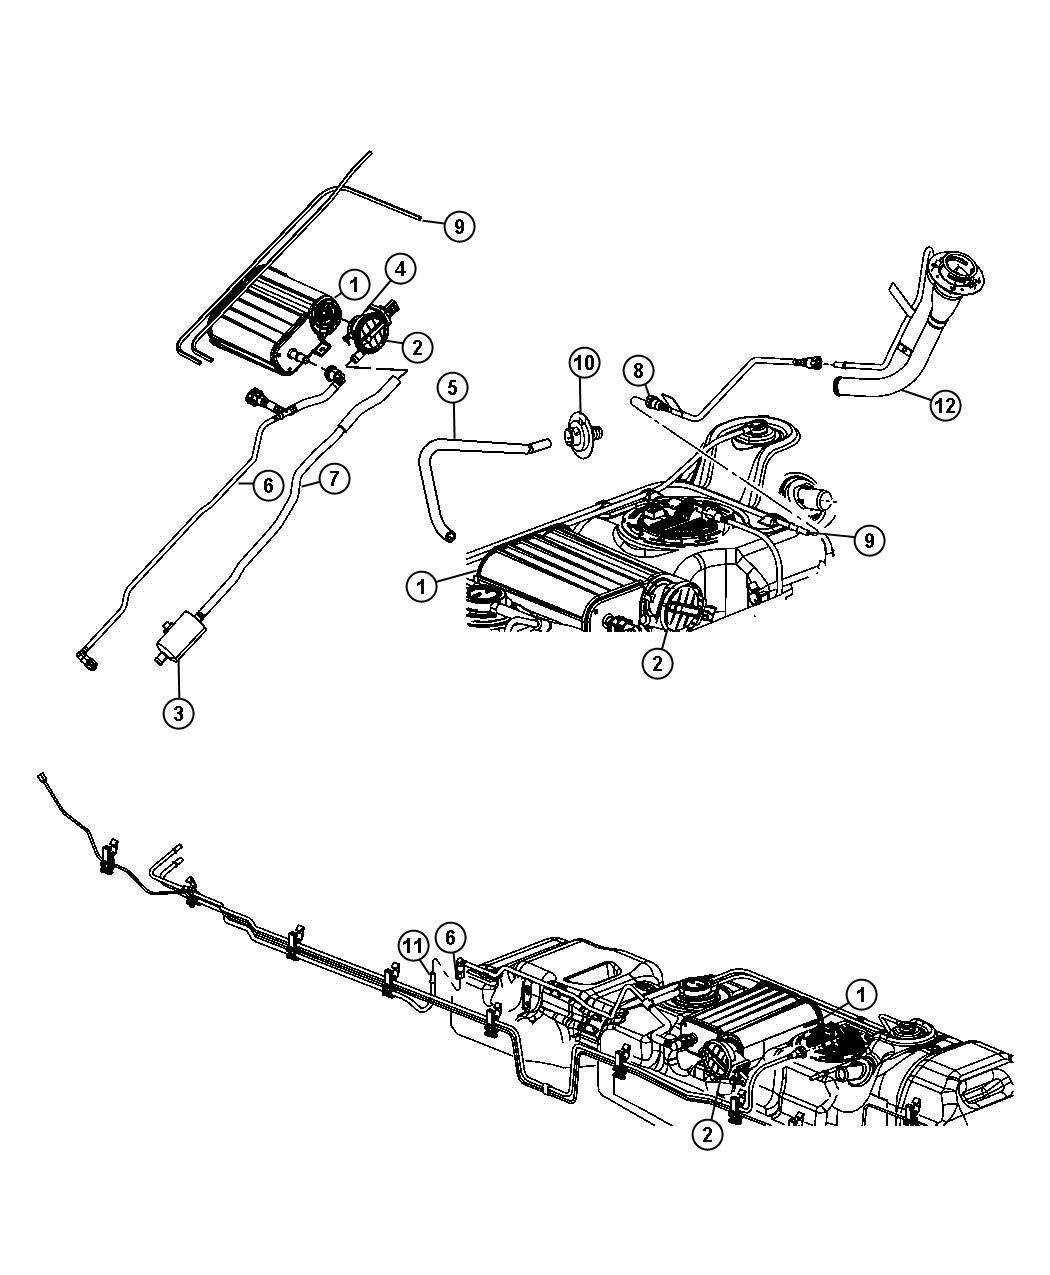 2007 Dodge Ram 1500 Detector. Evaporative system integrity